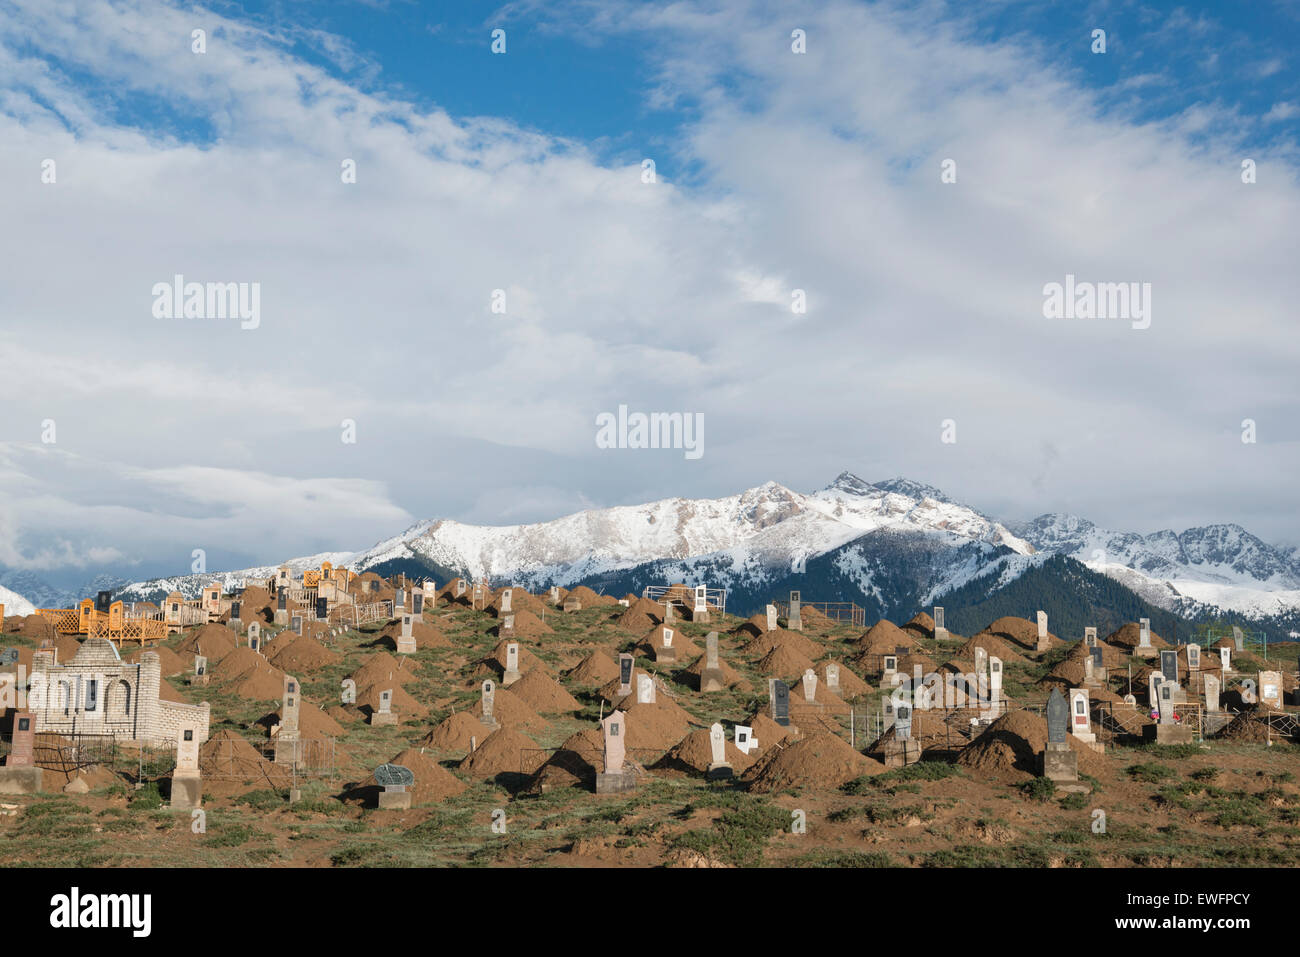 Cemetery. Barskoon. Lake Issyk-Köl. Kyrgyzstan. Central Asia. Stock Photo